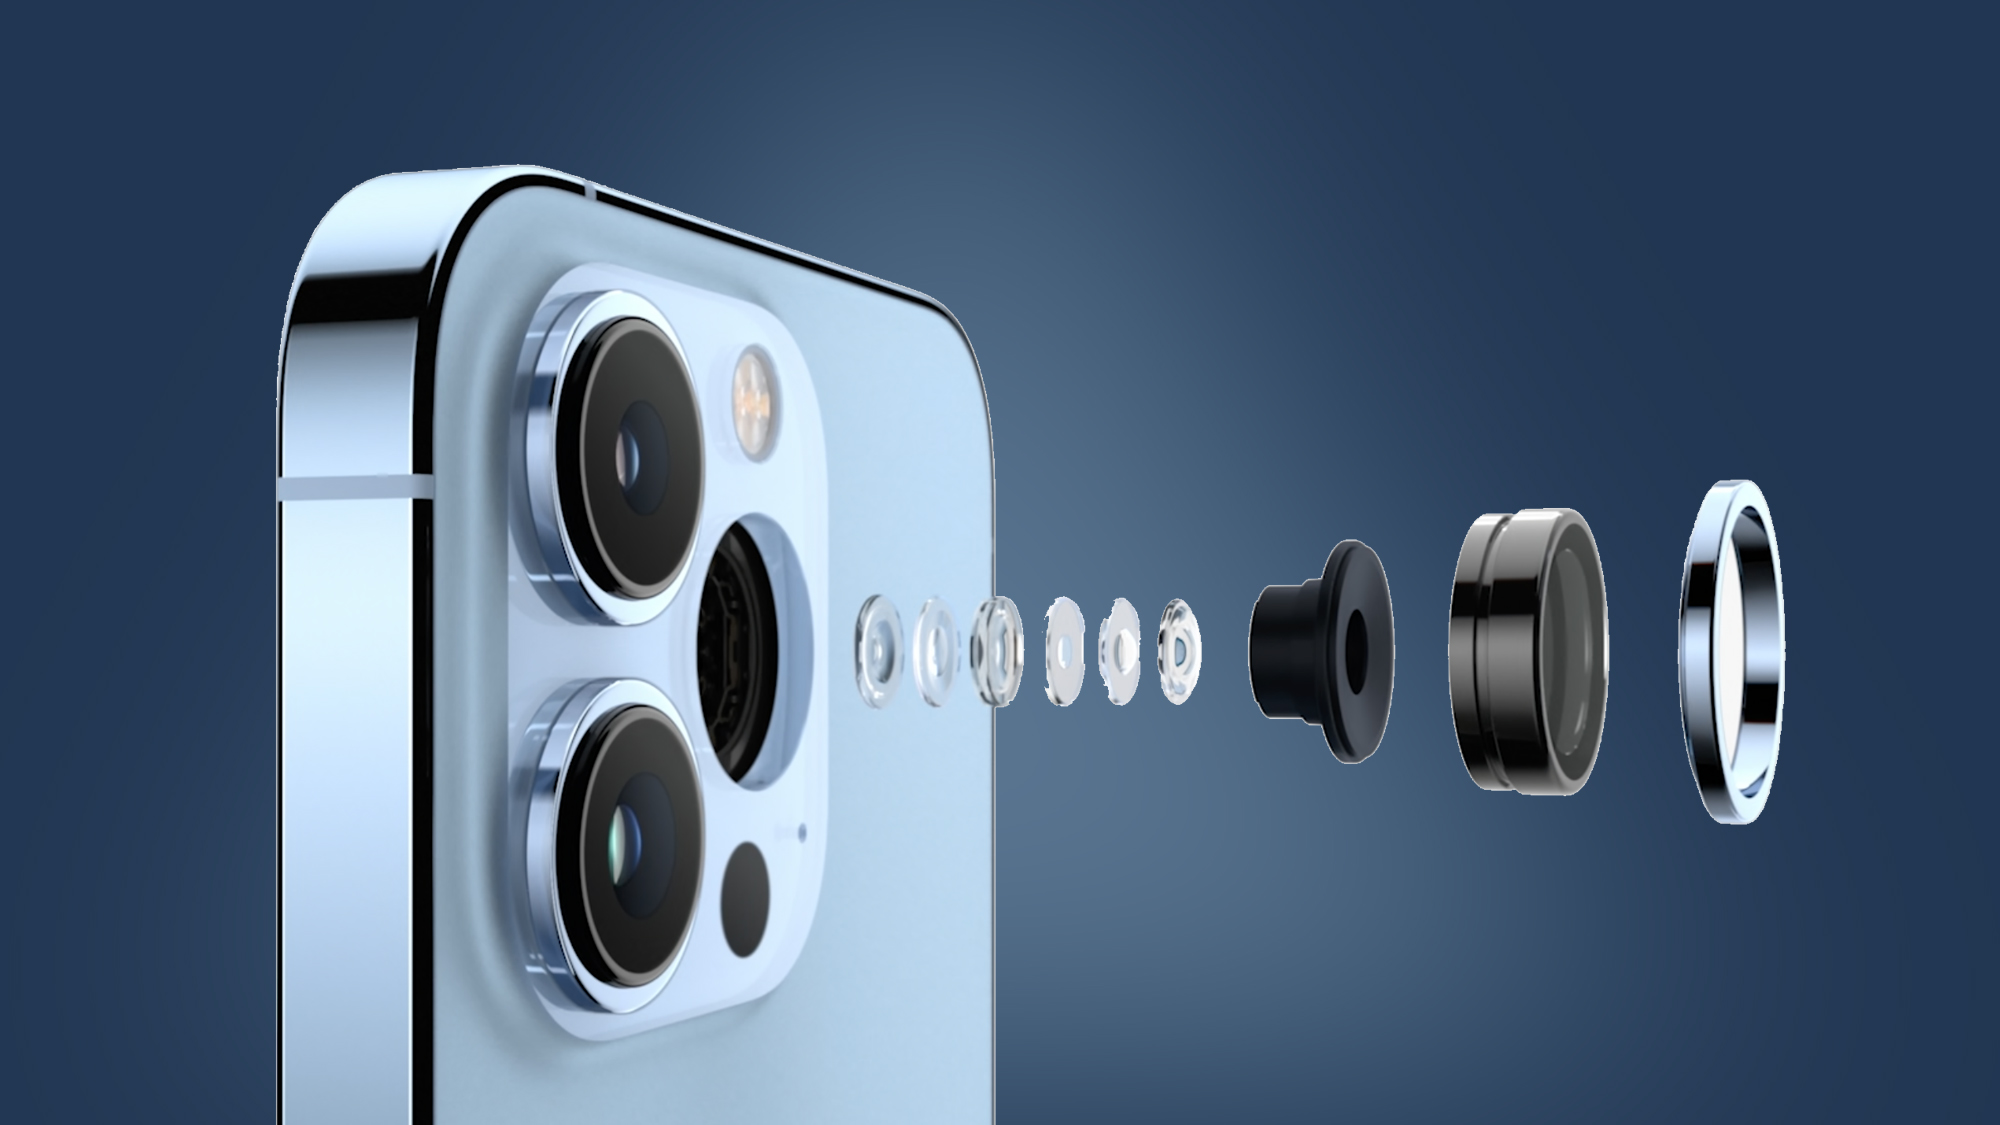 The iPhone 13 Pro's macro lens